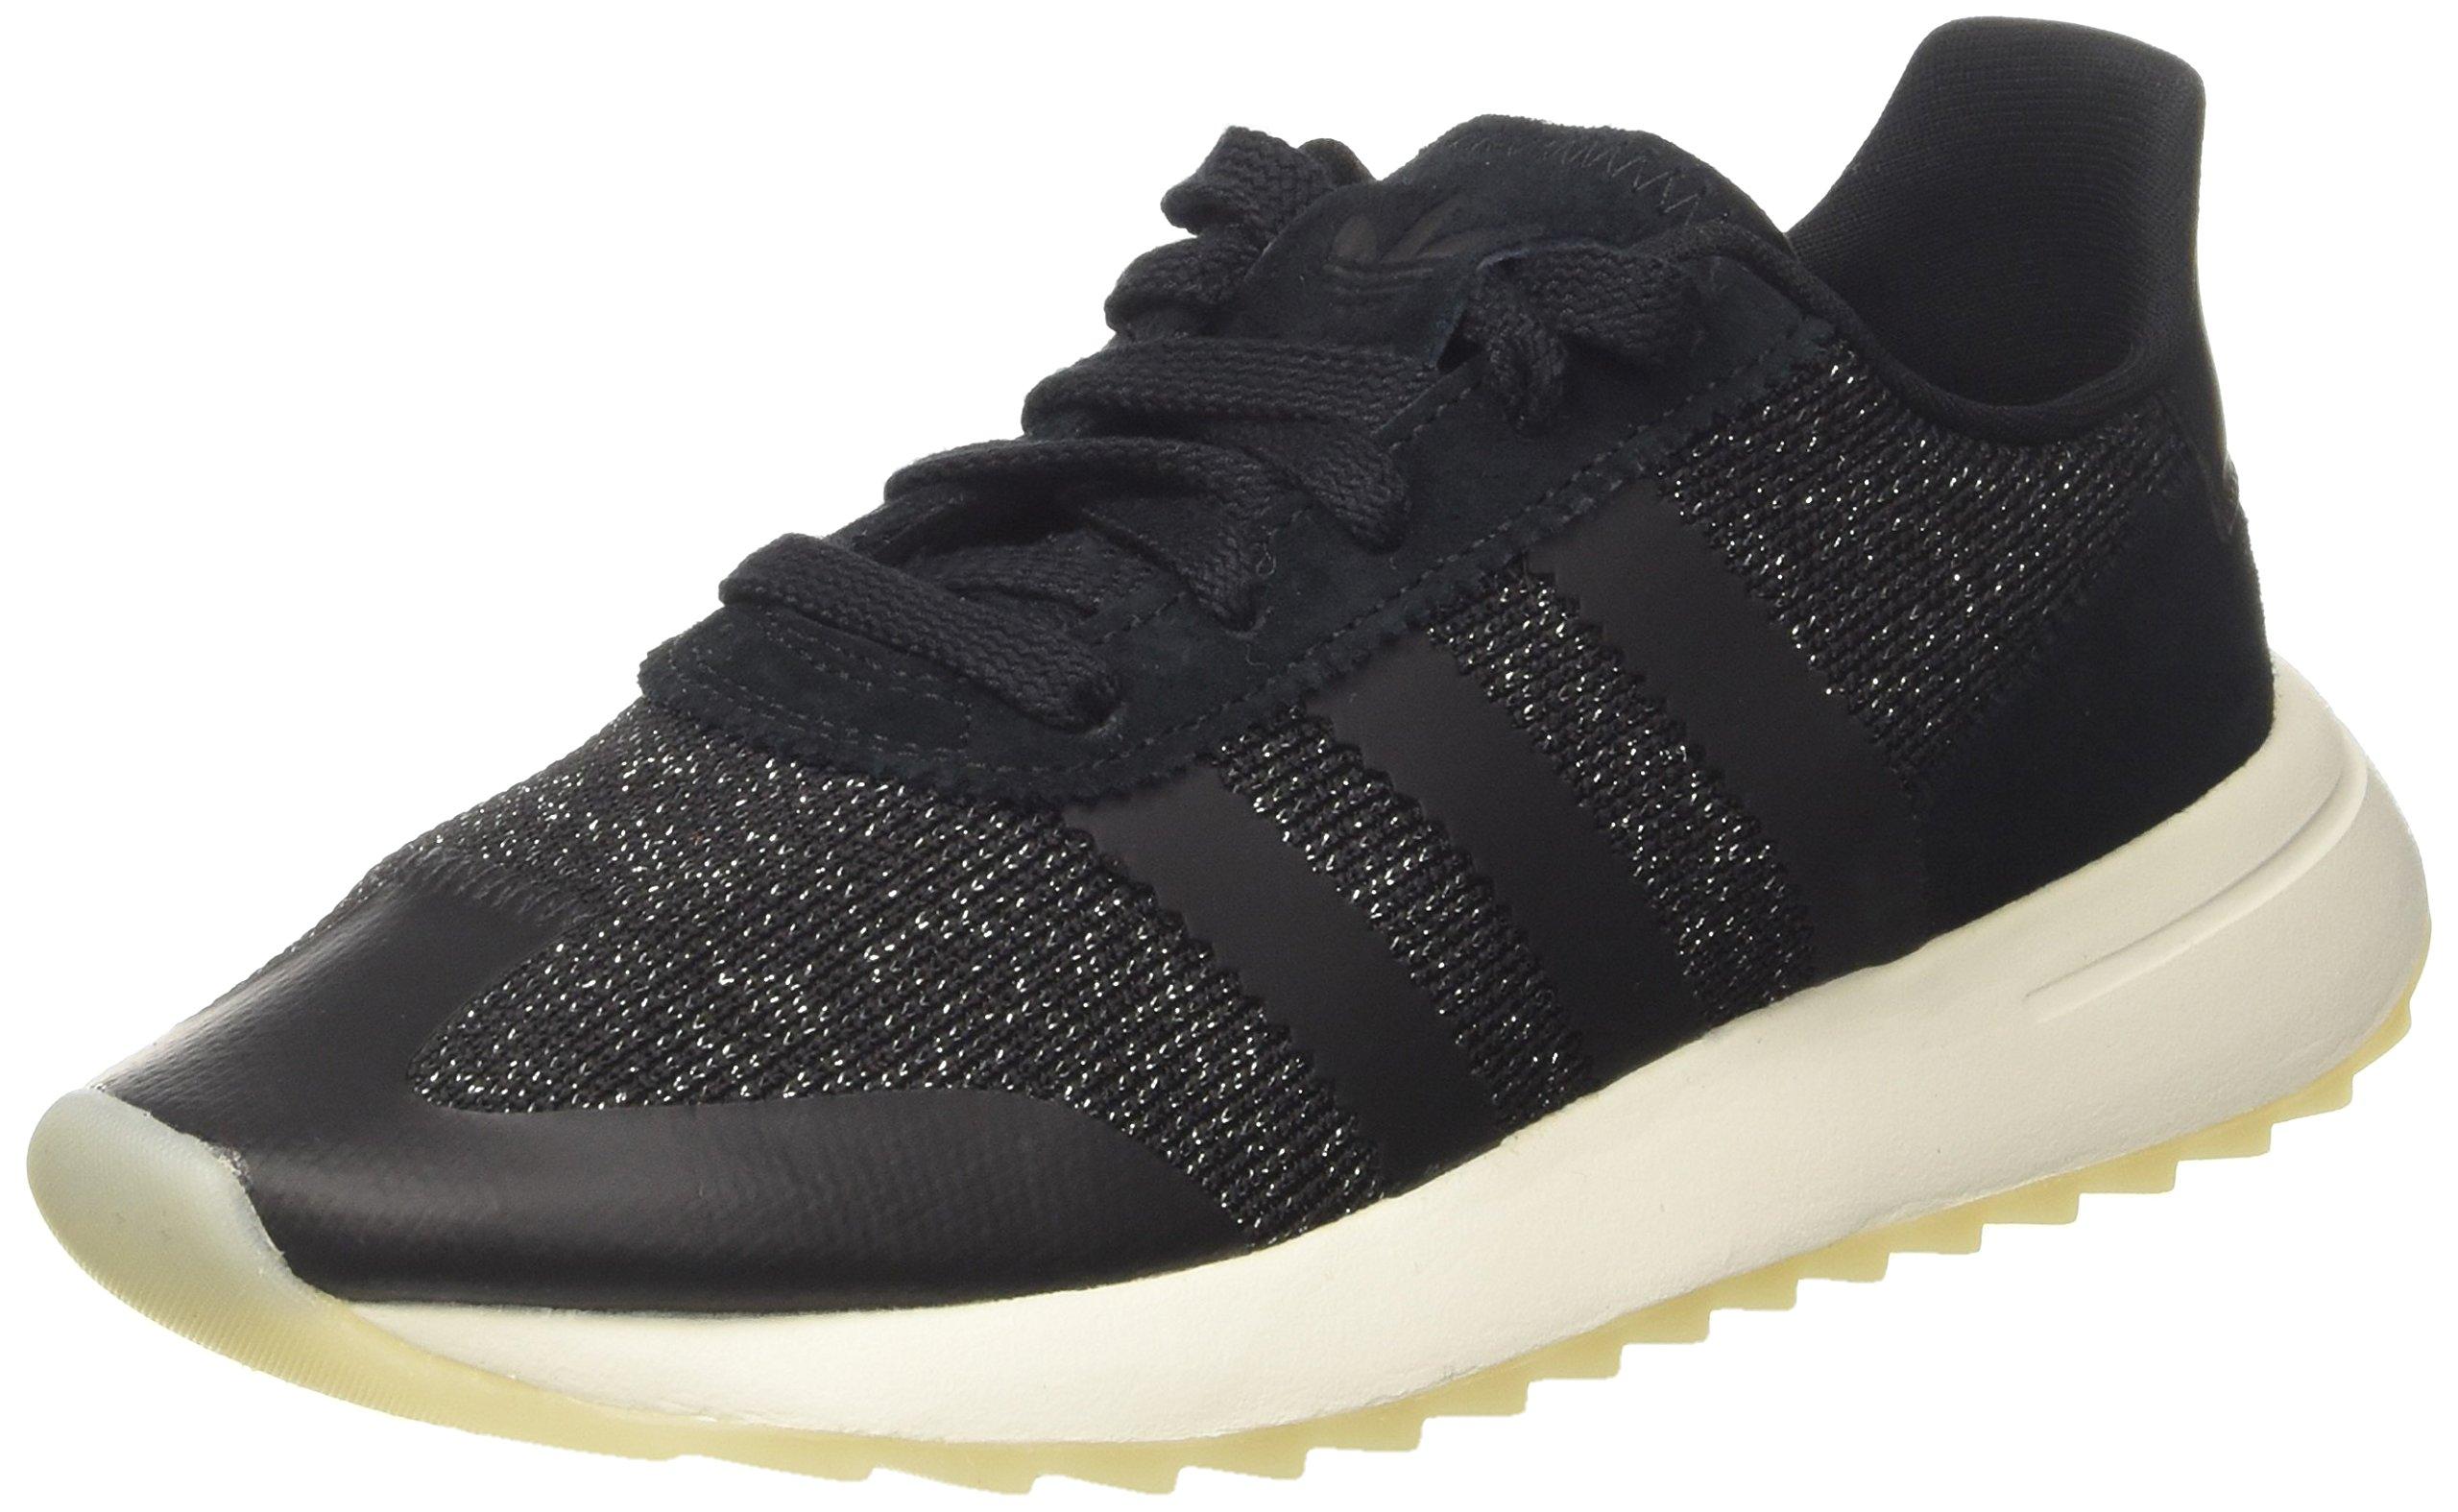 Core Black Eu Mode crystal Adidas 2 S1638 FemmeMulticolore White Basket Flb 3 rxBhCstdoQ